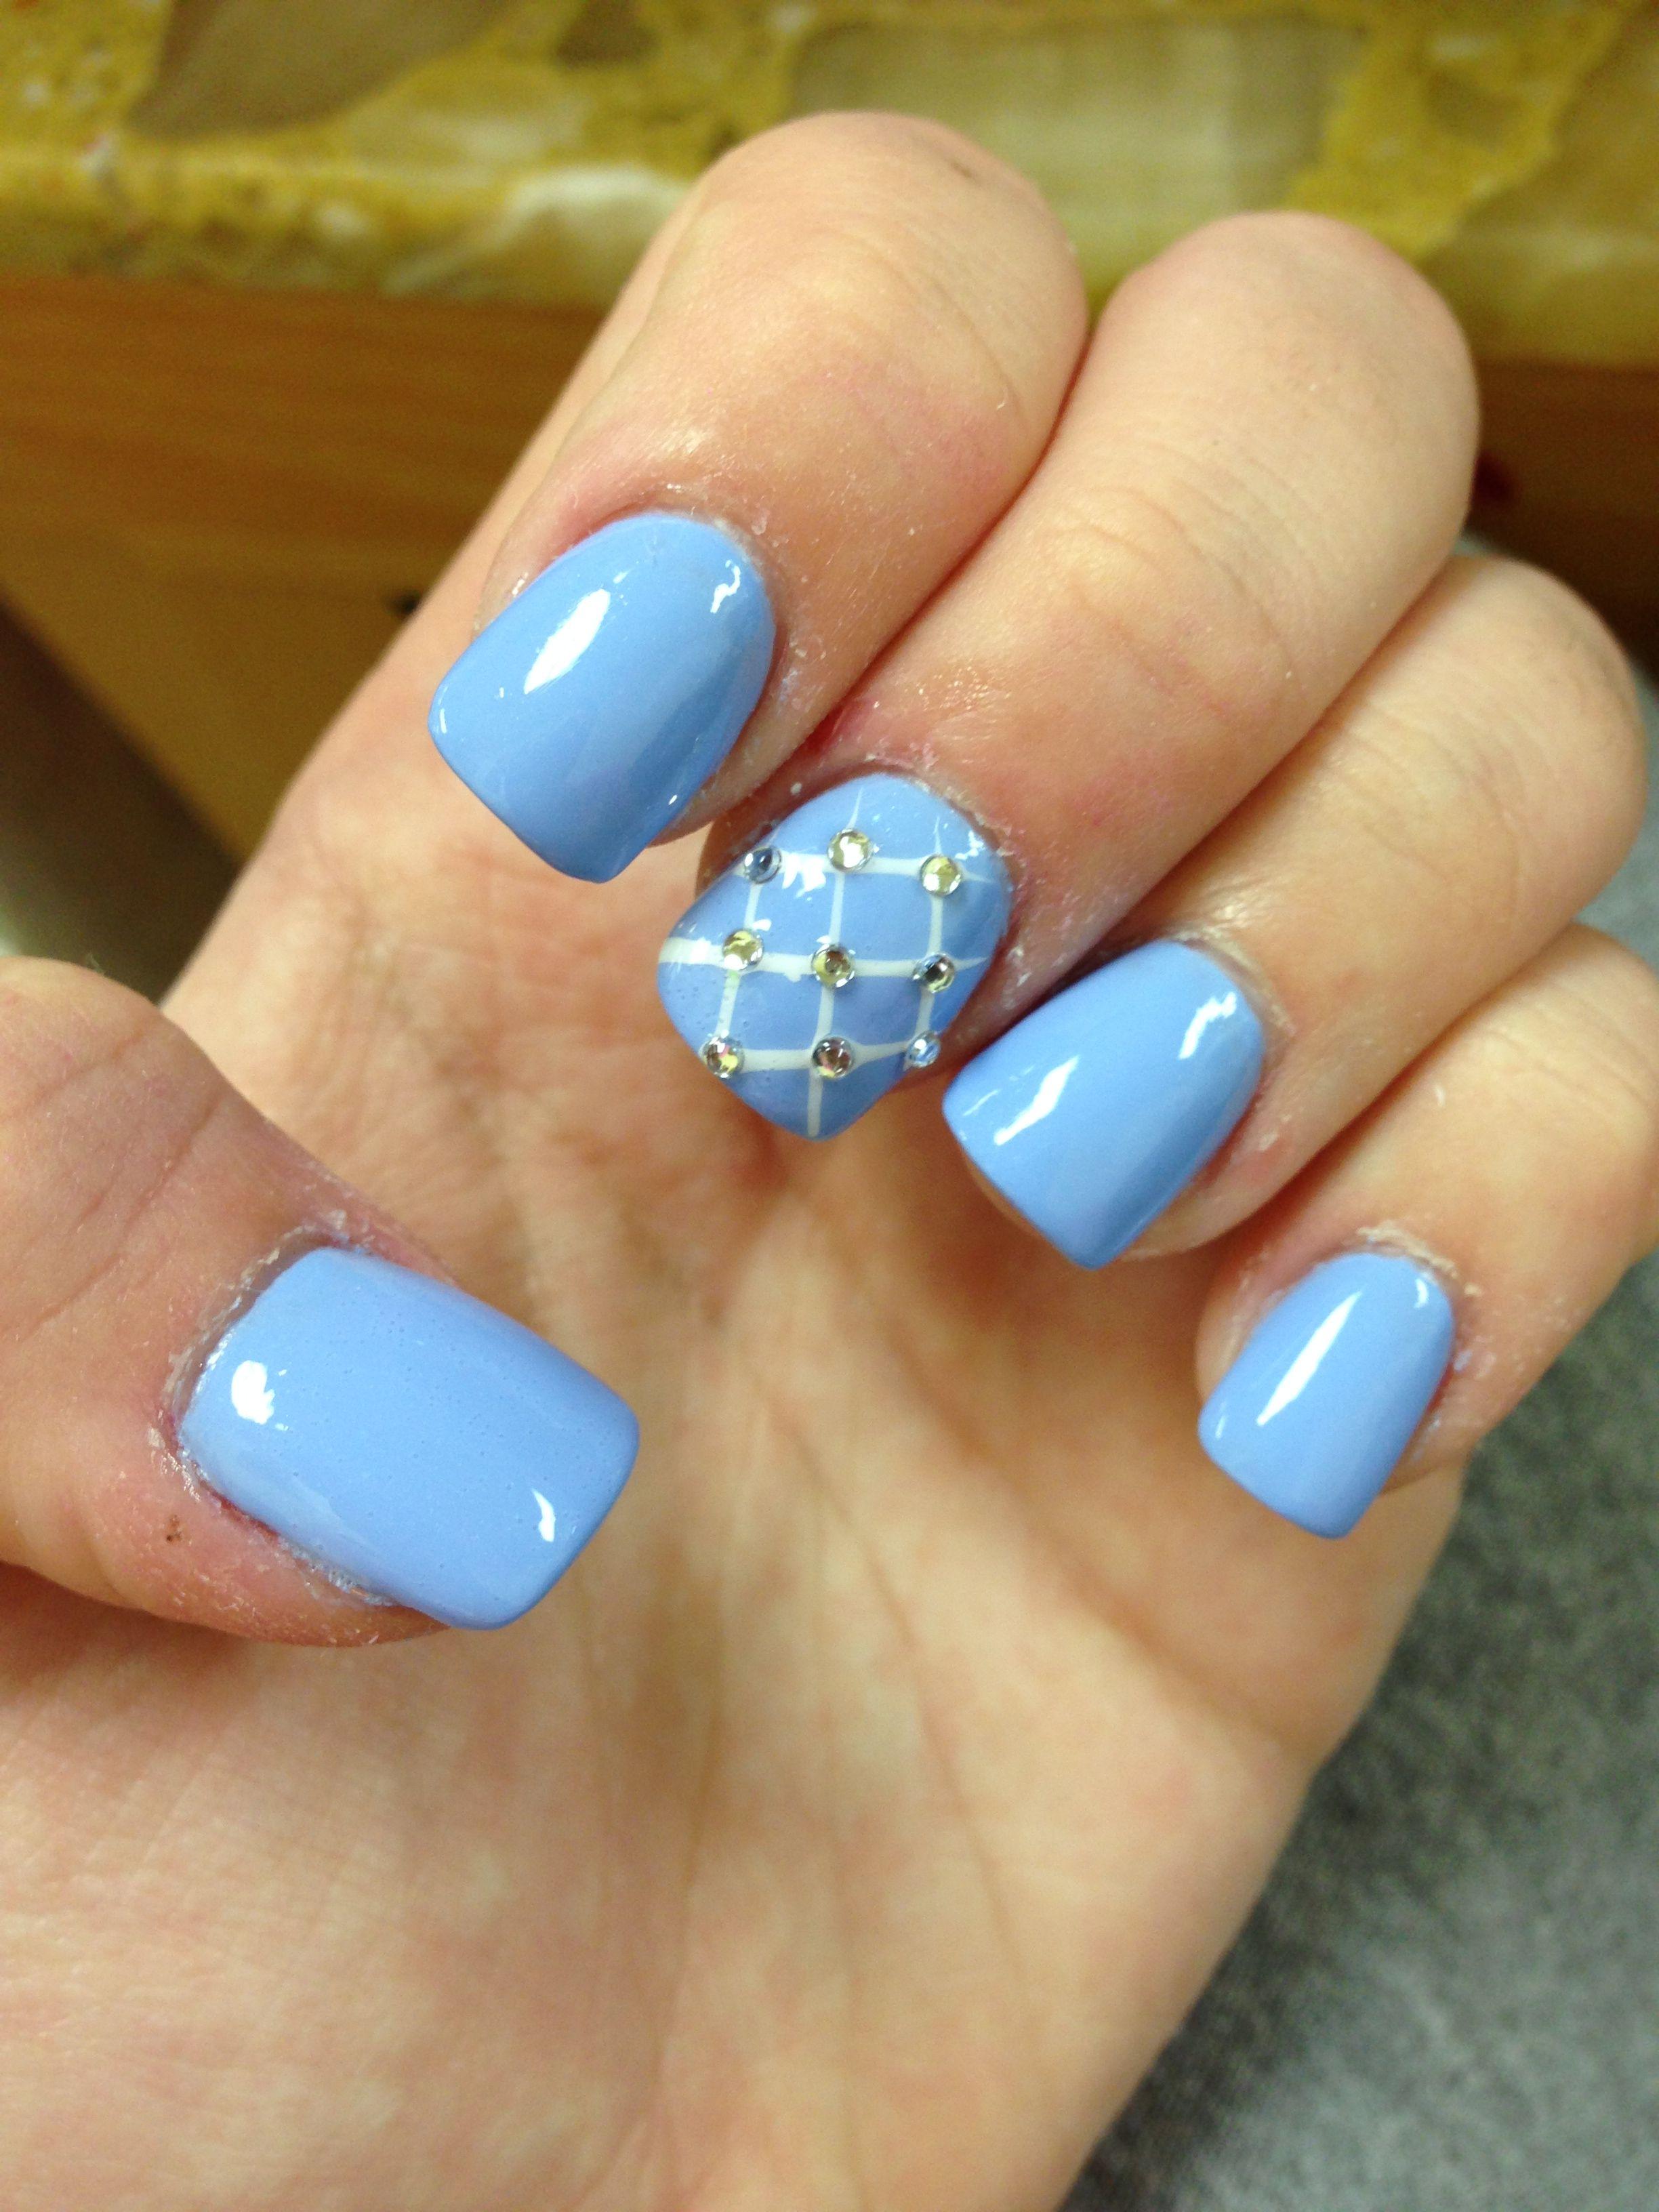 Blue diamond nails | Nails | Pinterest | Diamond nails, Blue nails ...